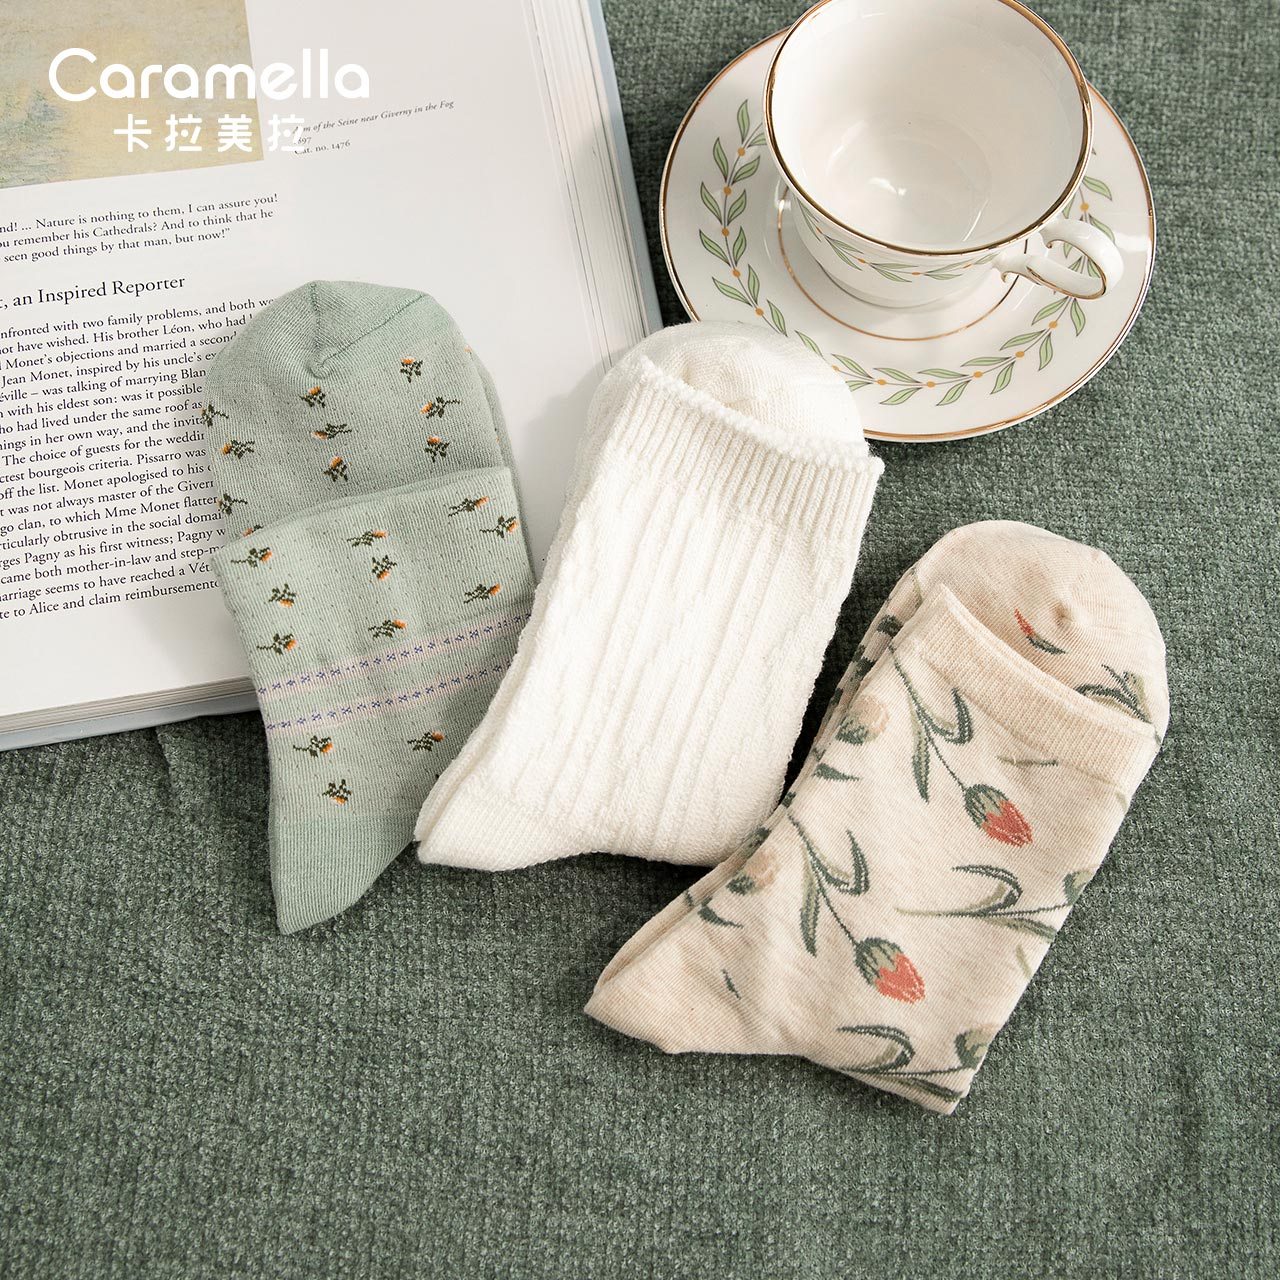 Caramella Artistic Retro Socks Women's Ins Trendy Spring and Autumn Long Tube Japanese Online Red Co